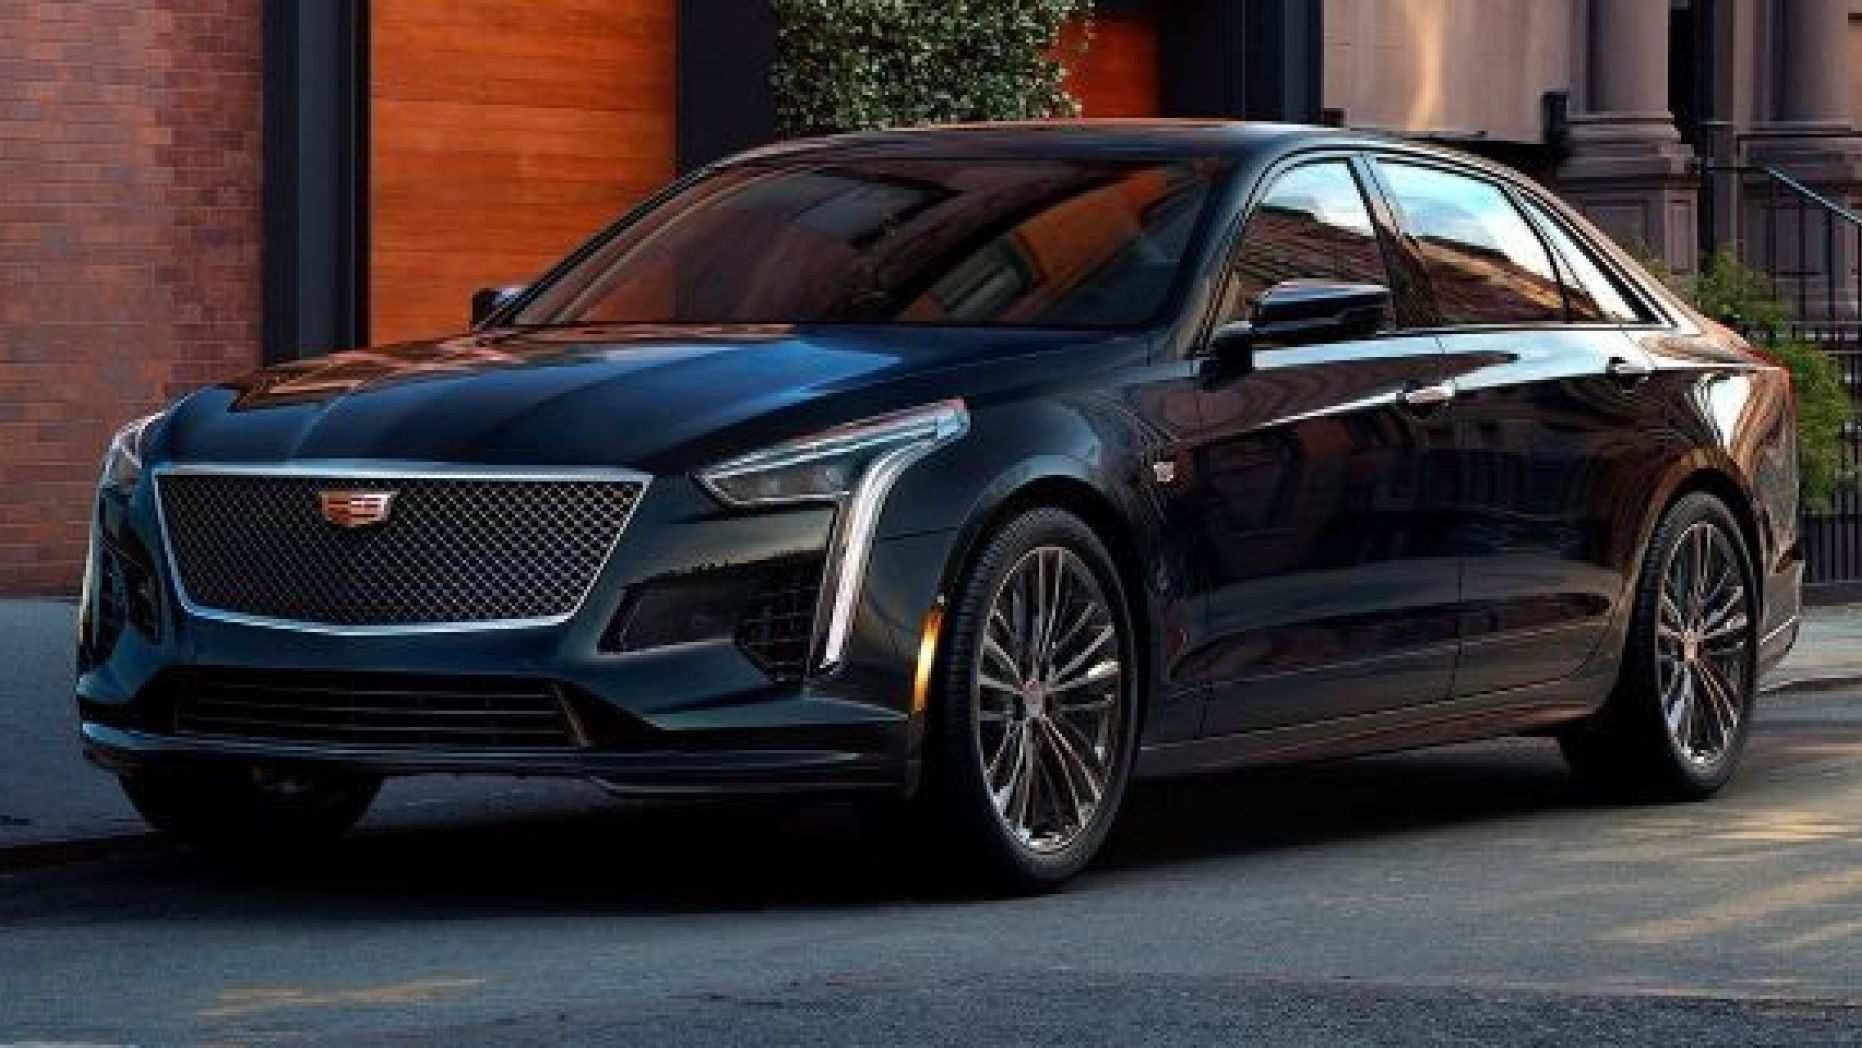 84 All New 2019 Cadillac V8 Exterior and Interior by 2019 Cadillac V8